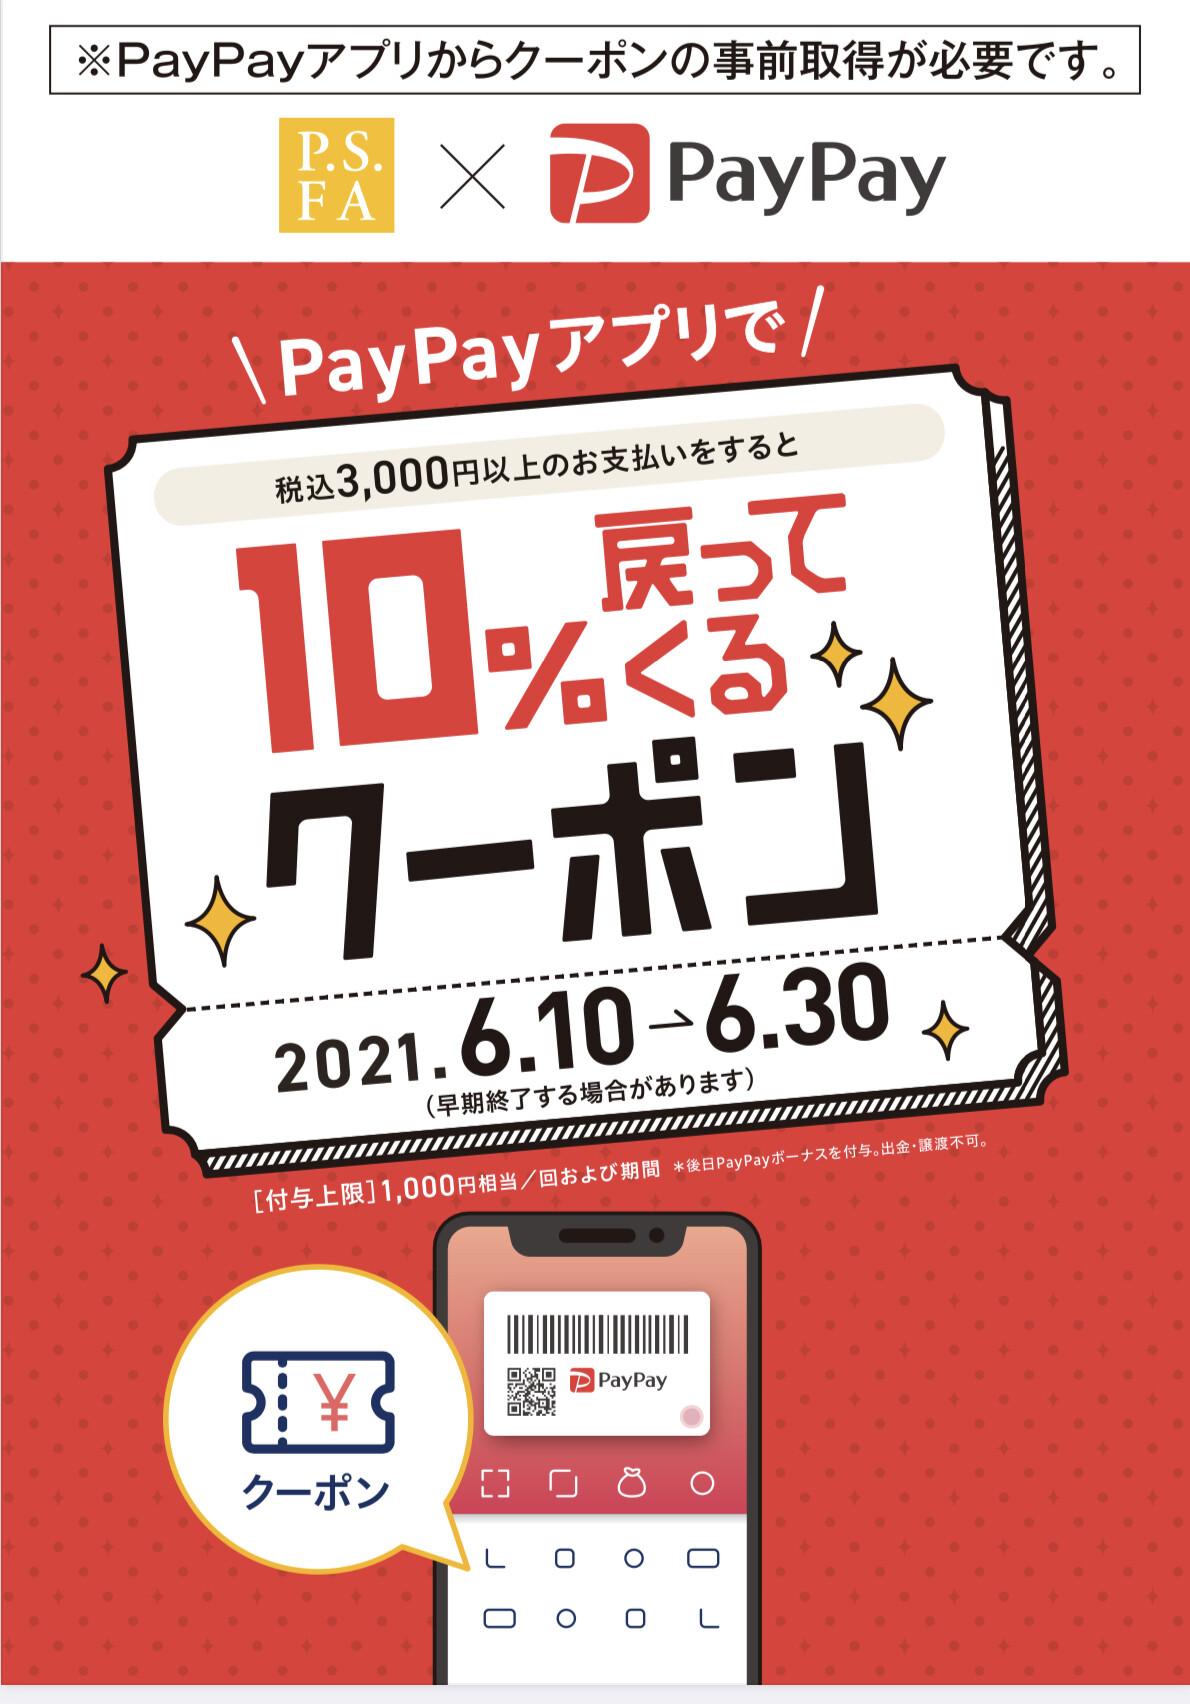 【PayPay×P.S.FA】10%戻ってくるクーポン